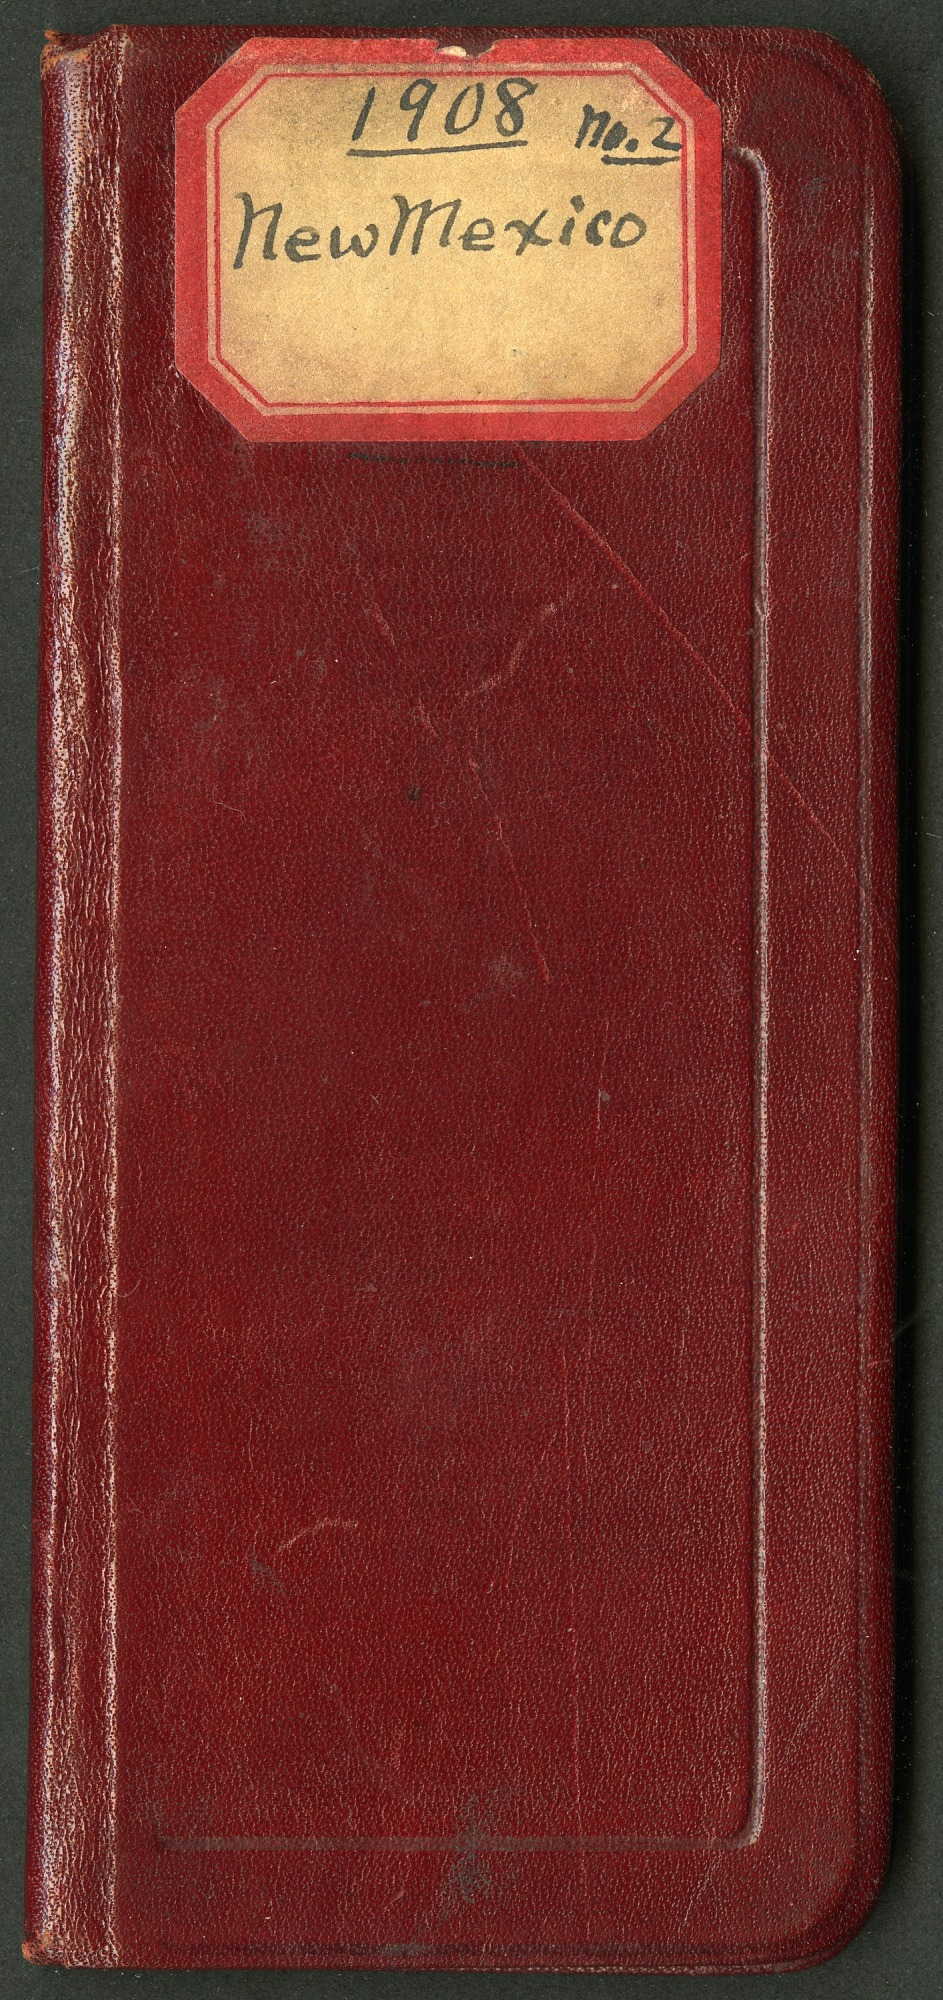 Field notes, New Mexico, October 12-November 15, 1908